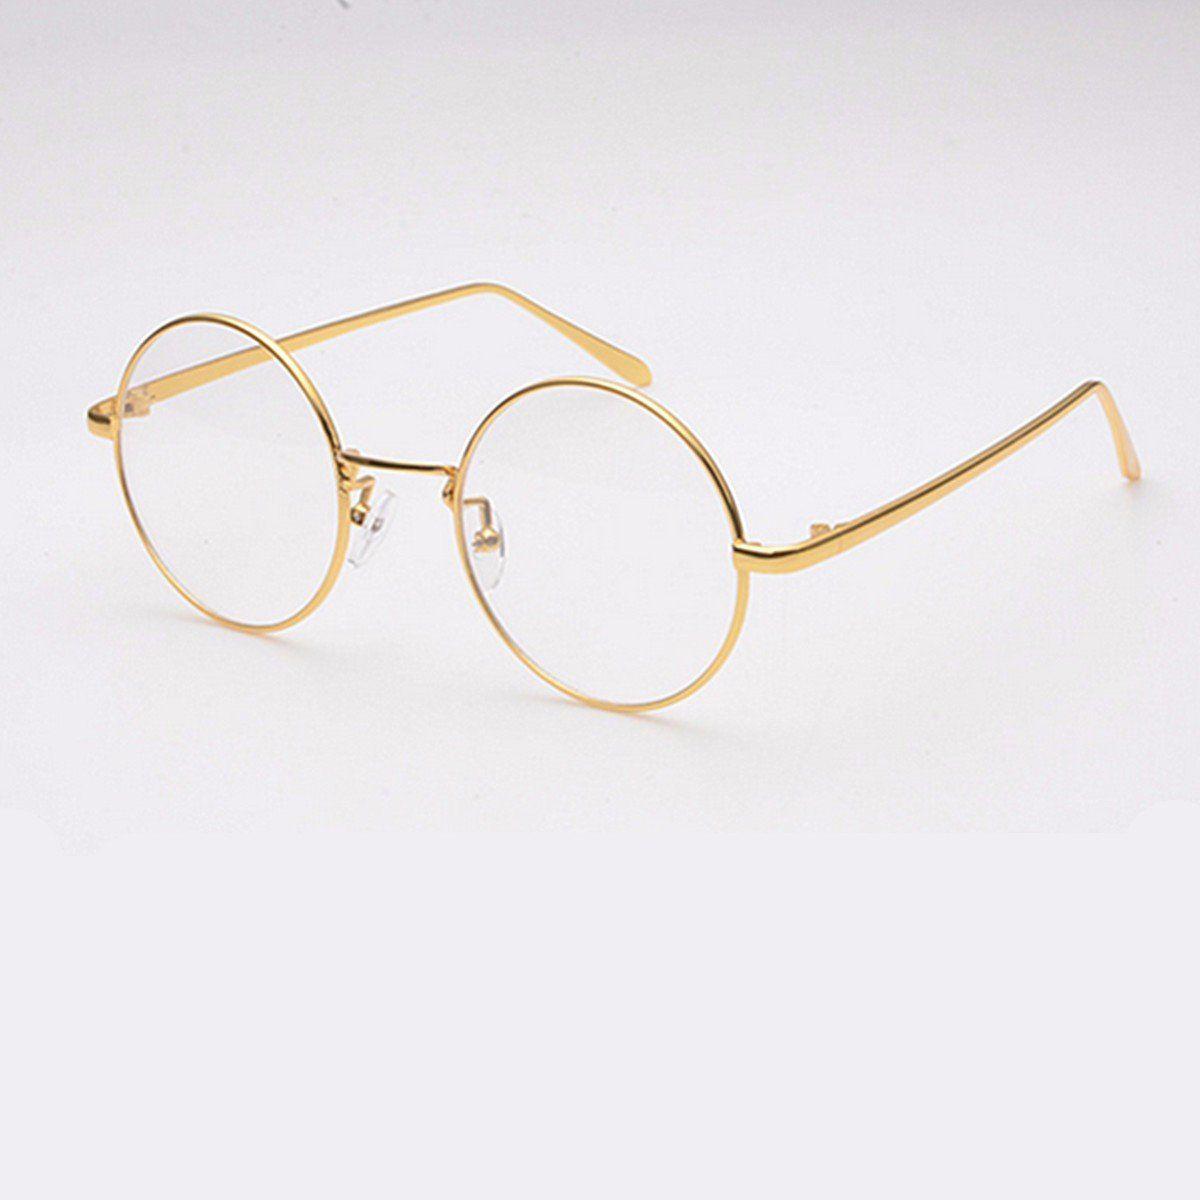 b343cb2e49c4 GOLD Metal Vintage Round Eyeglass Frame Clear Lens Full-Rim Glasses sold  out - Banggood